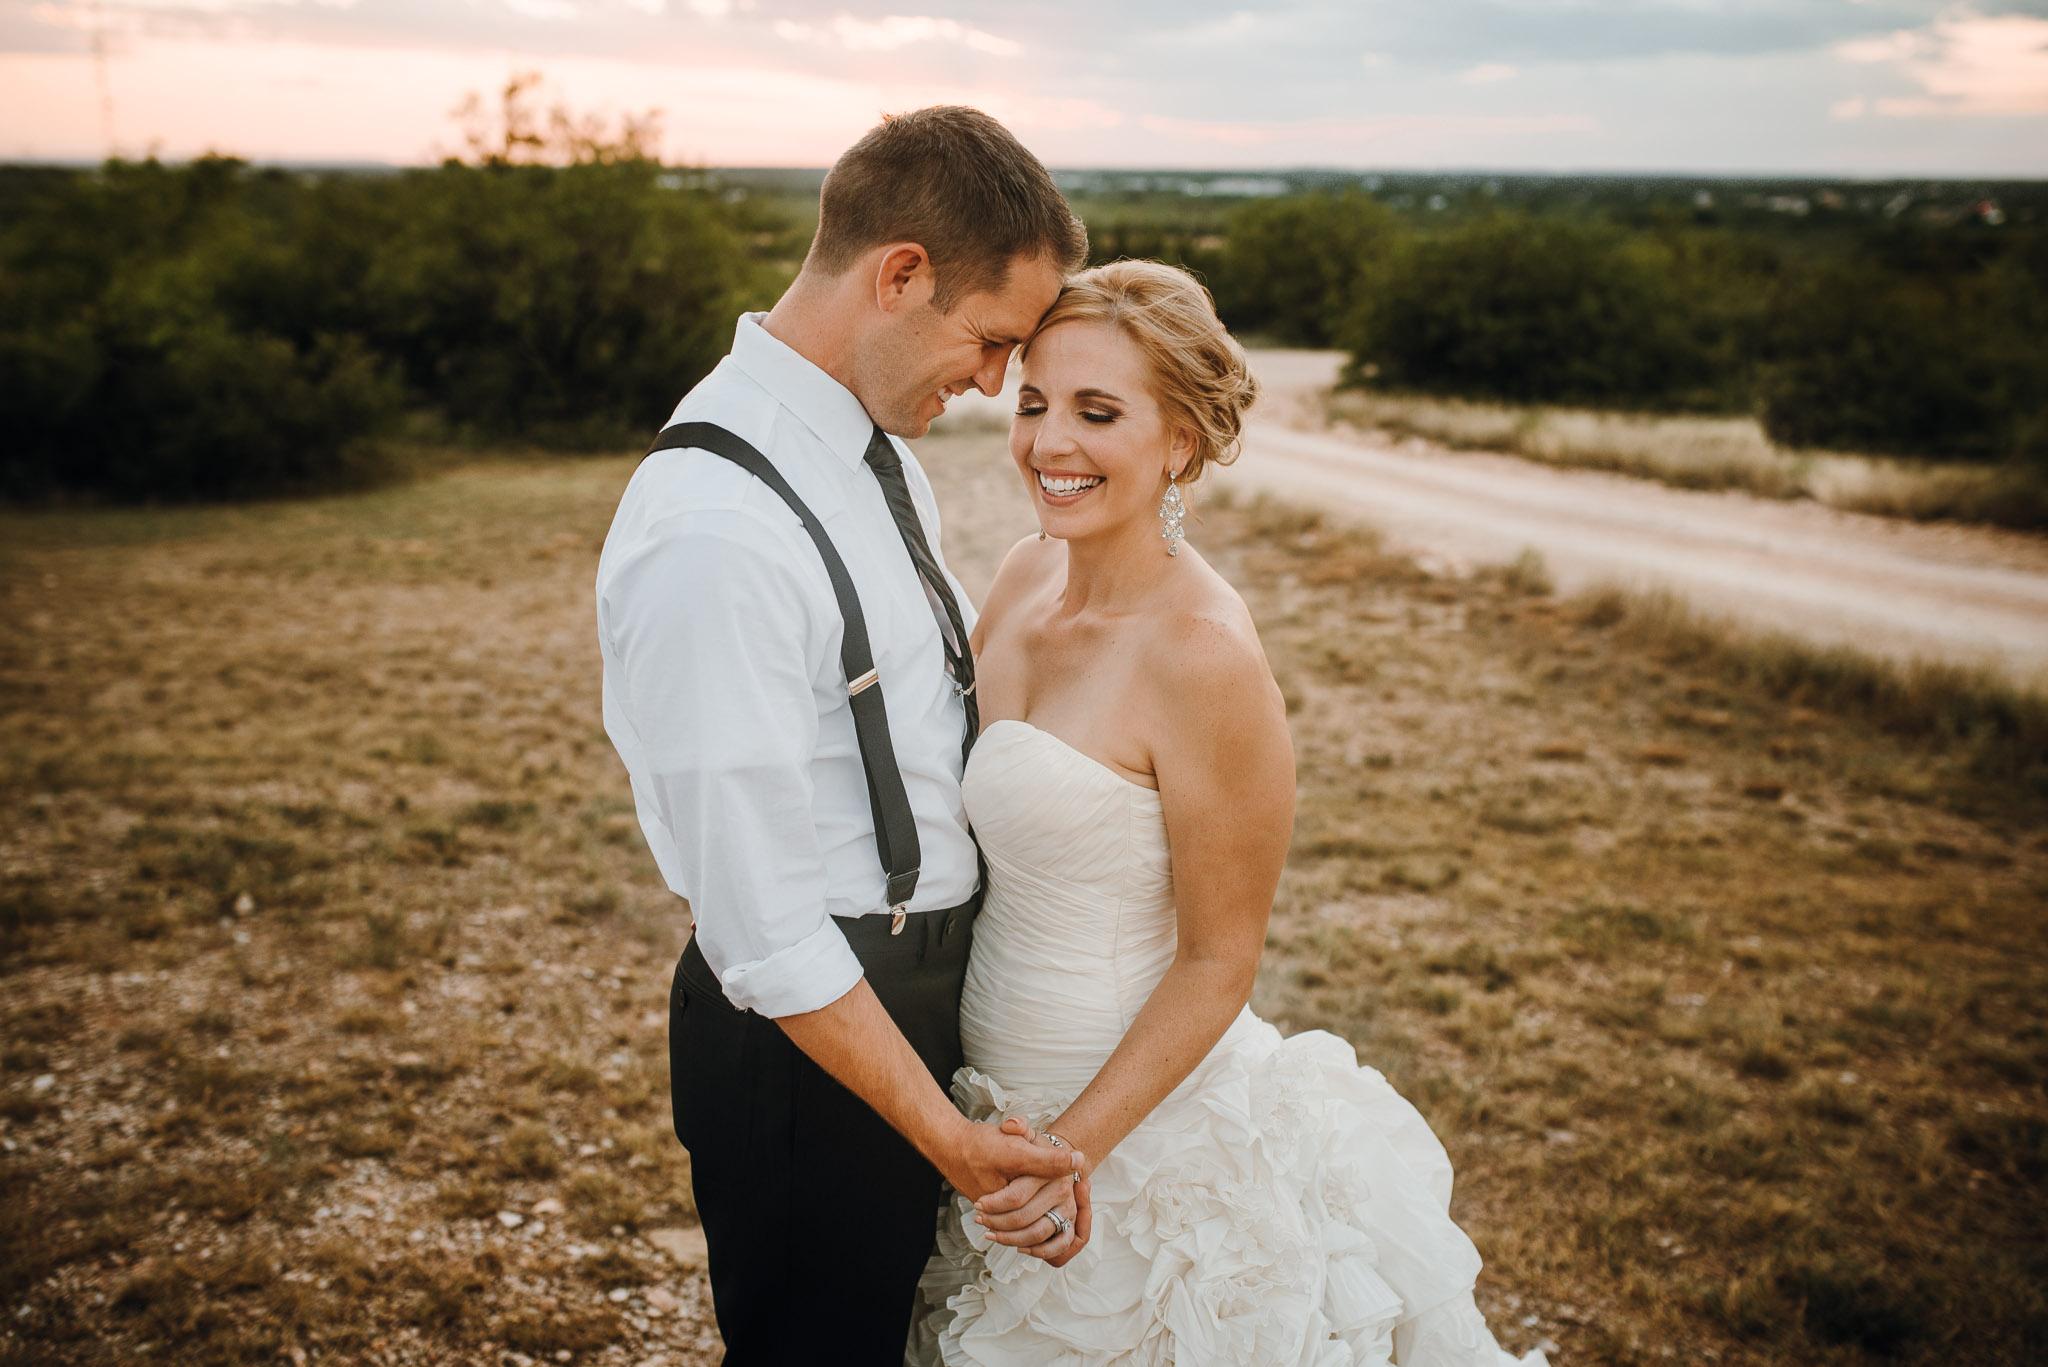 Rowena-West-Texas-Wedding-Photographer-Gillian&Ryan-0051.jpg